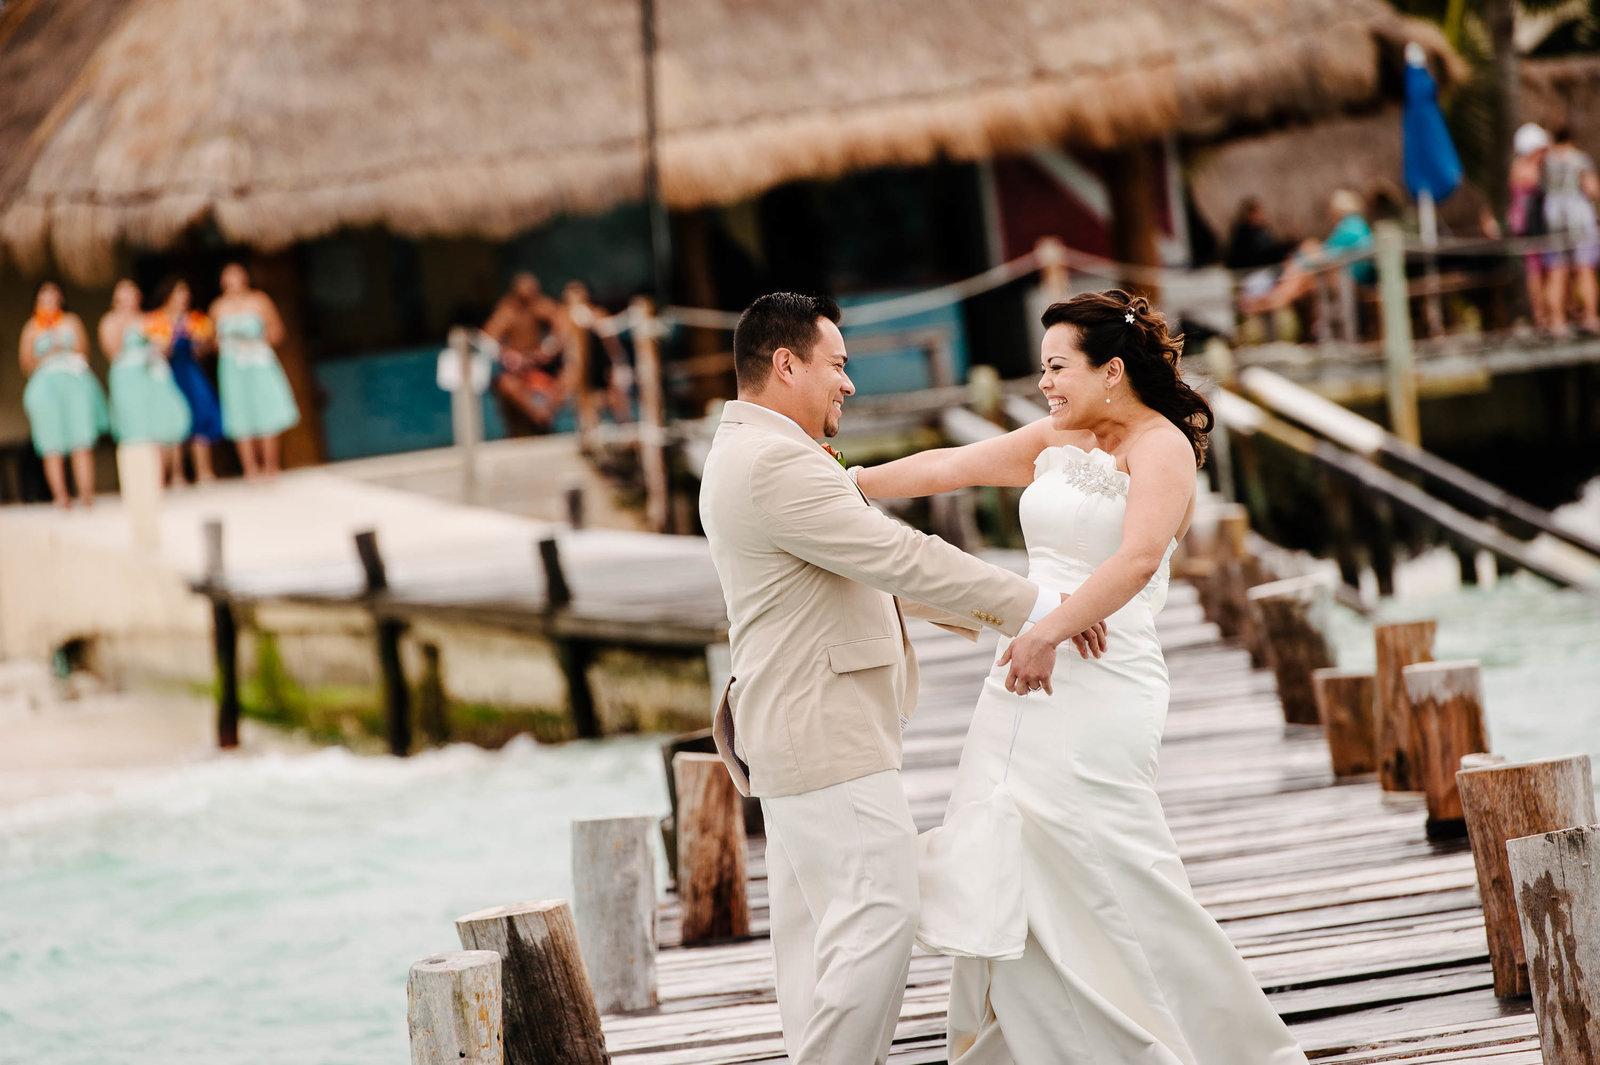 171-El-paso-wedding-photographer-El Paso Wedding Photographer_M08